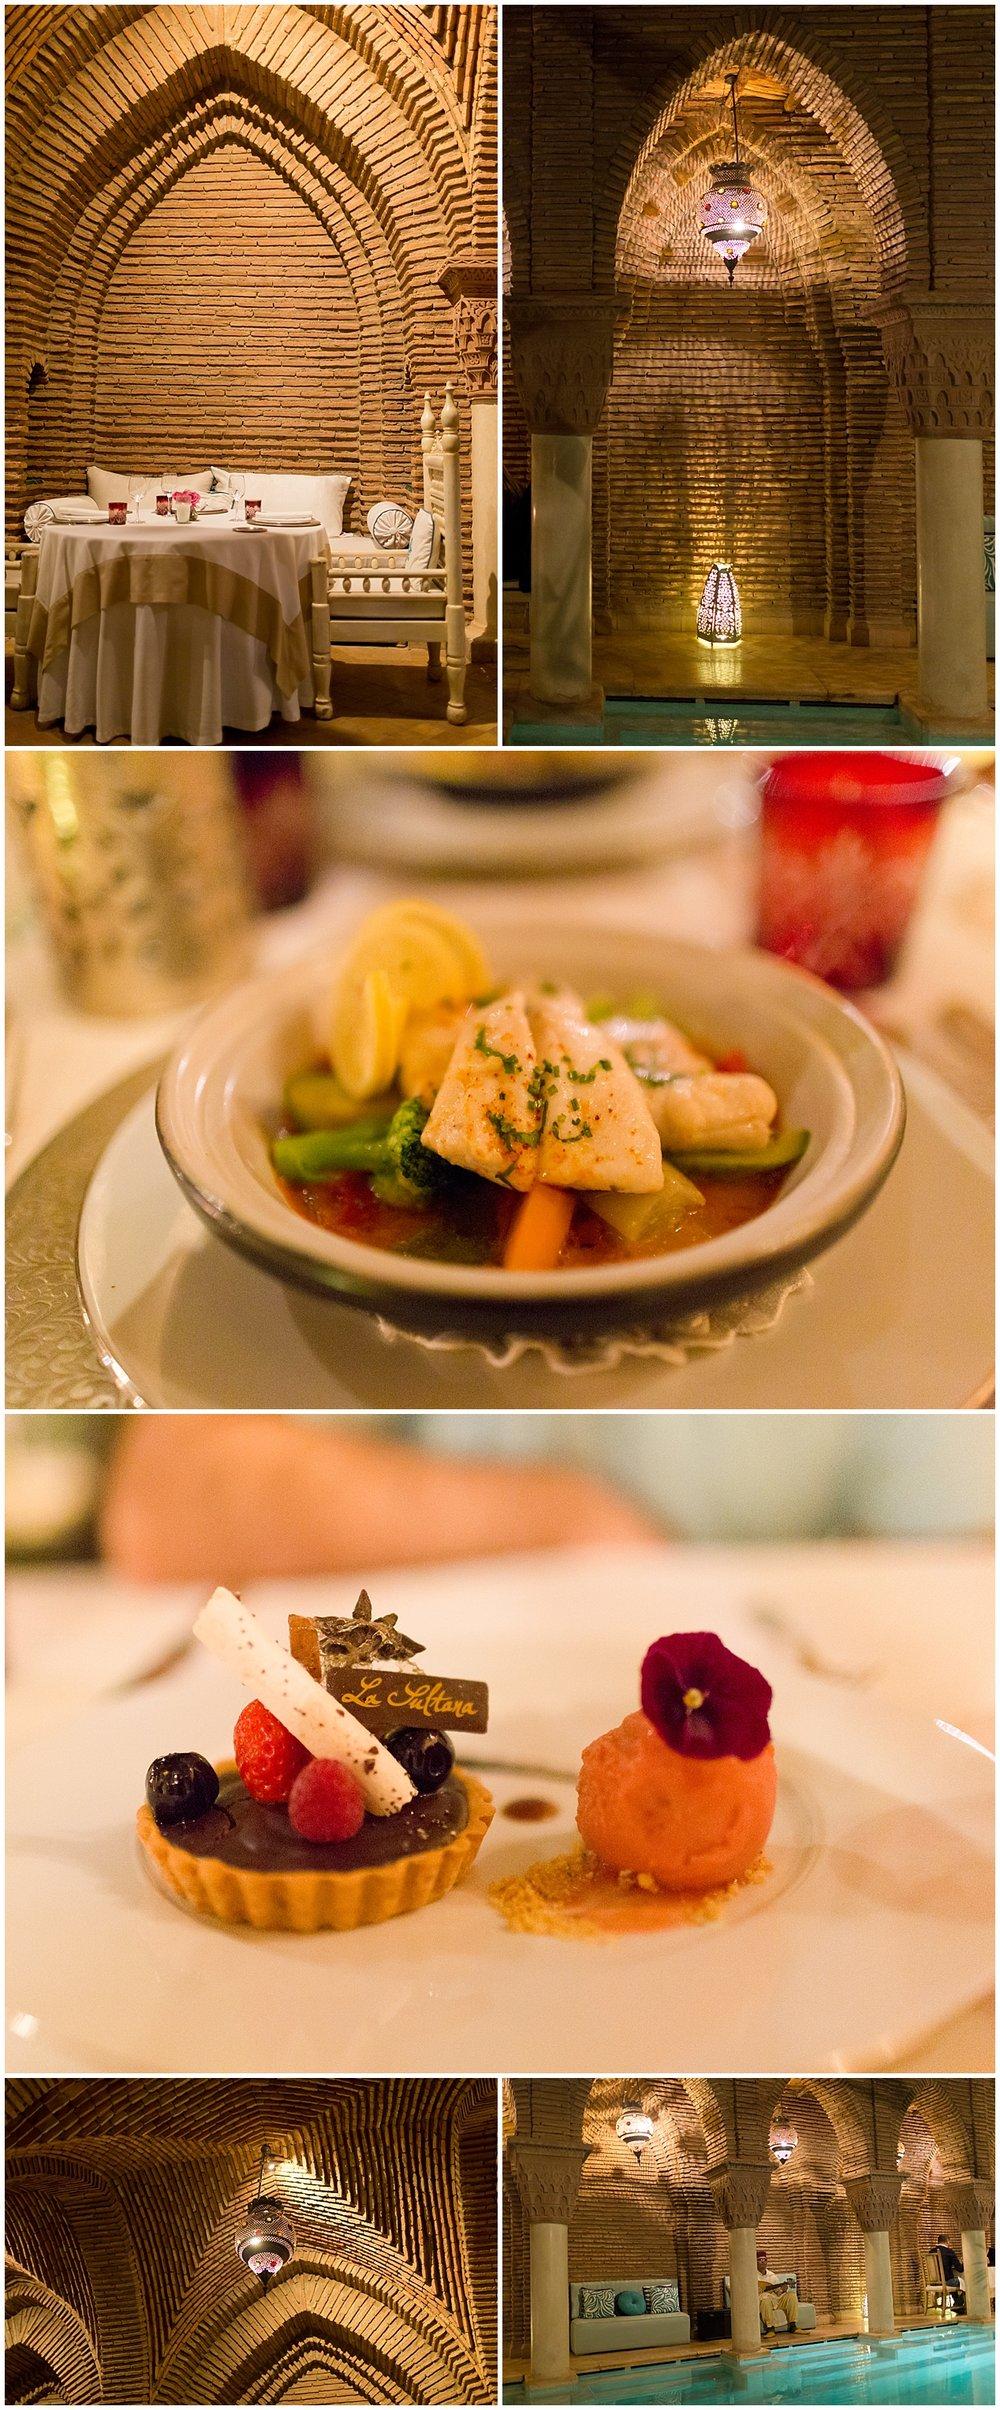 food and Moroccan decor at La Sultana restaurant in Marrakech, Morocco